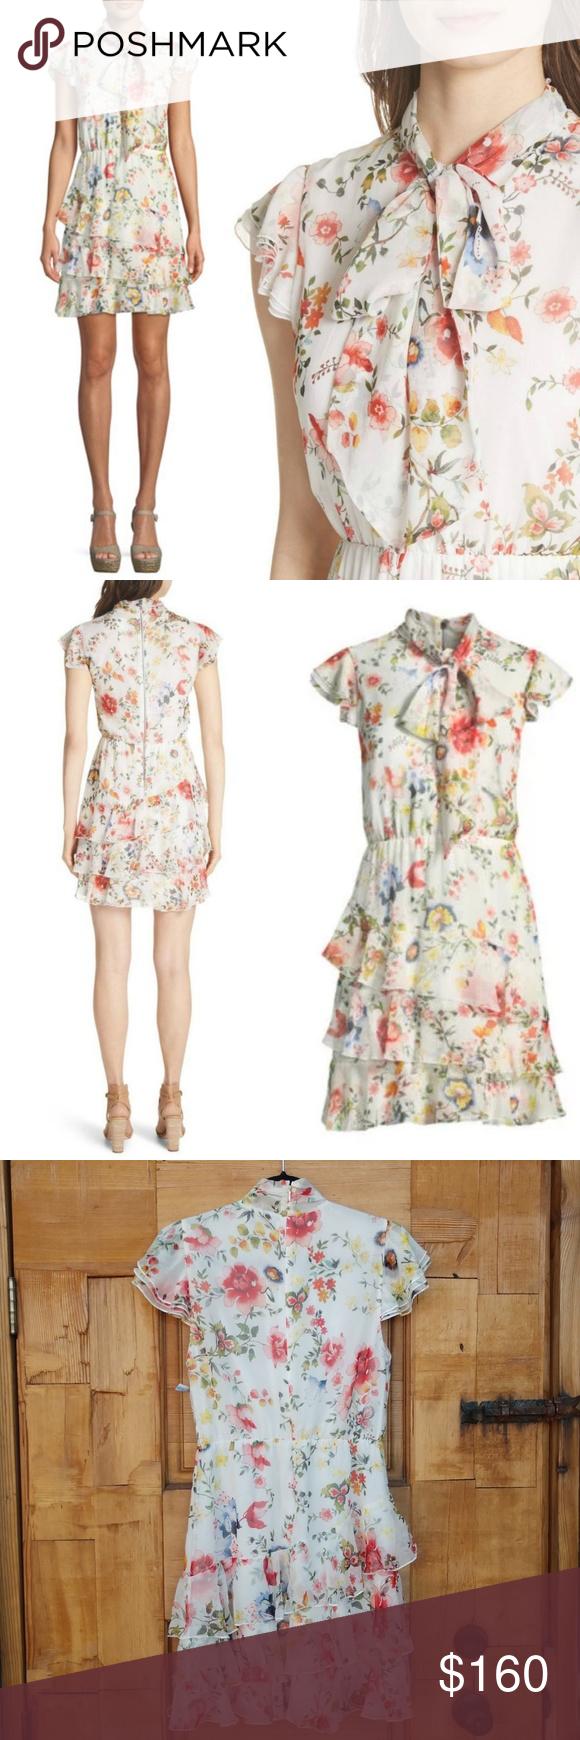 7dc8fd8bf93 New ALICE + OLIVIA Lessie Floral Tie Neck Dress Alice and Olivia Lessie Tie  Neck Short